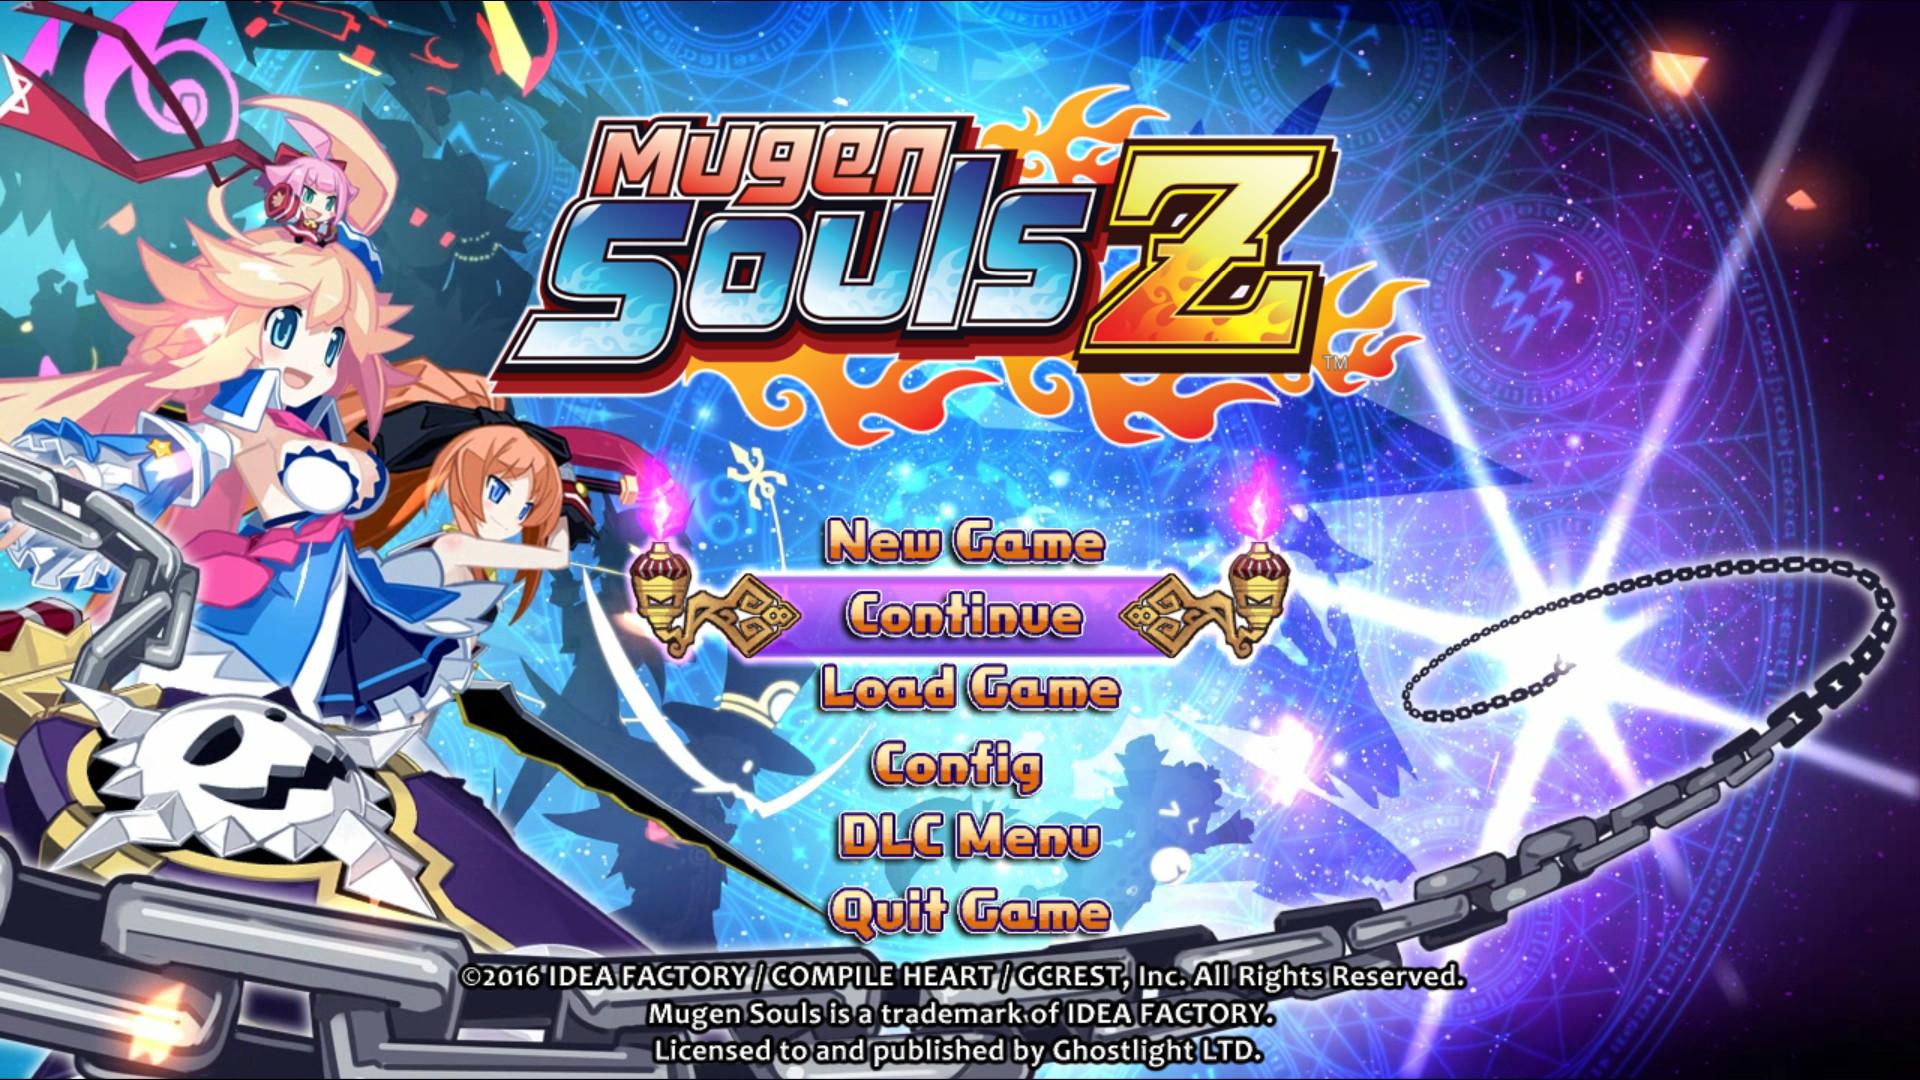 Mugen Souls Z - Clothing Bundle 2 screenshot